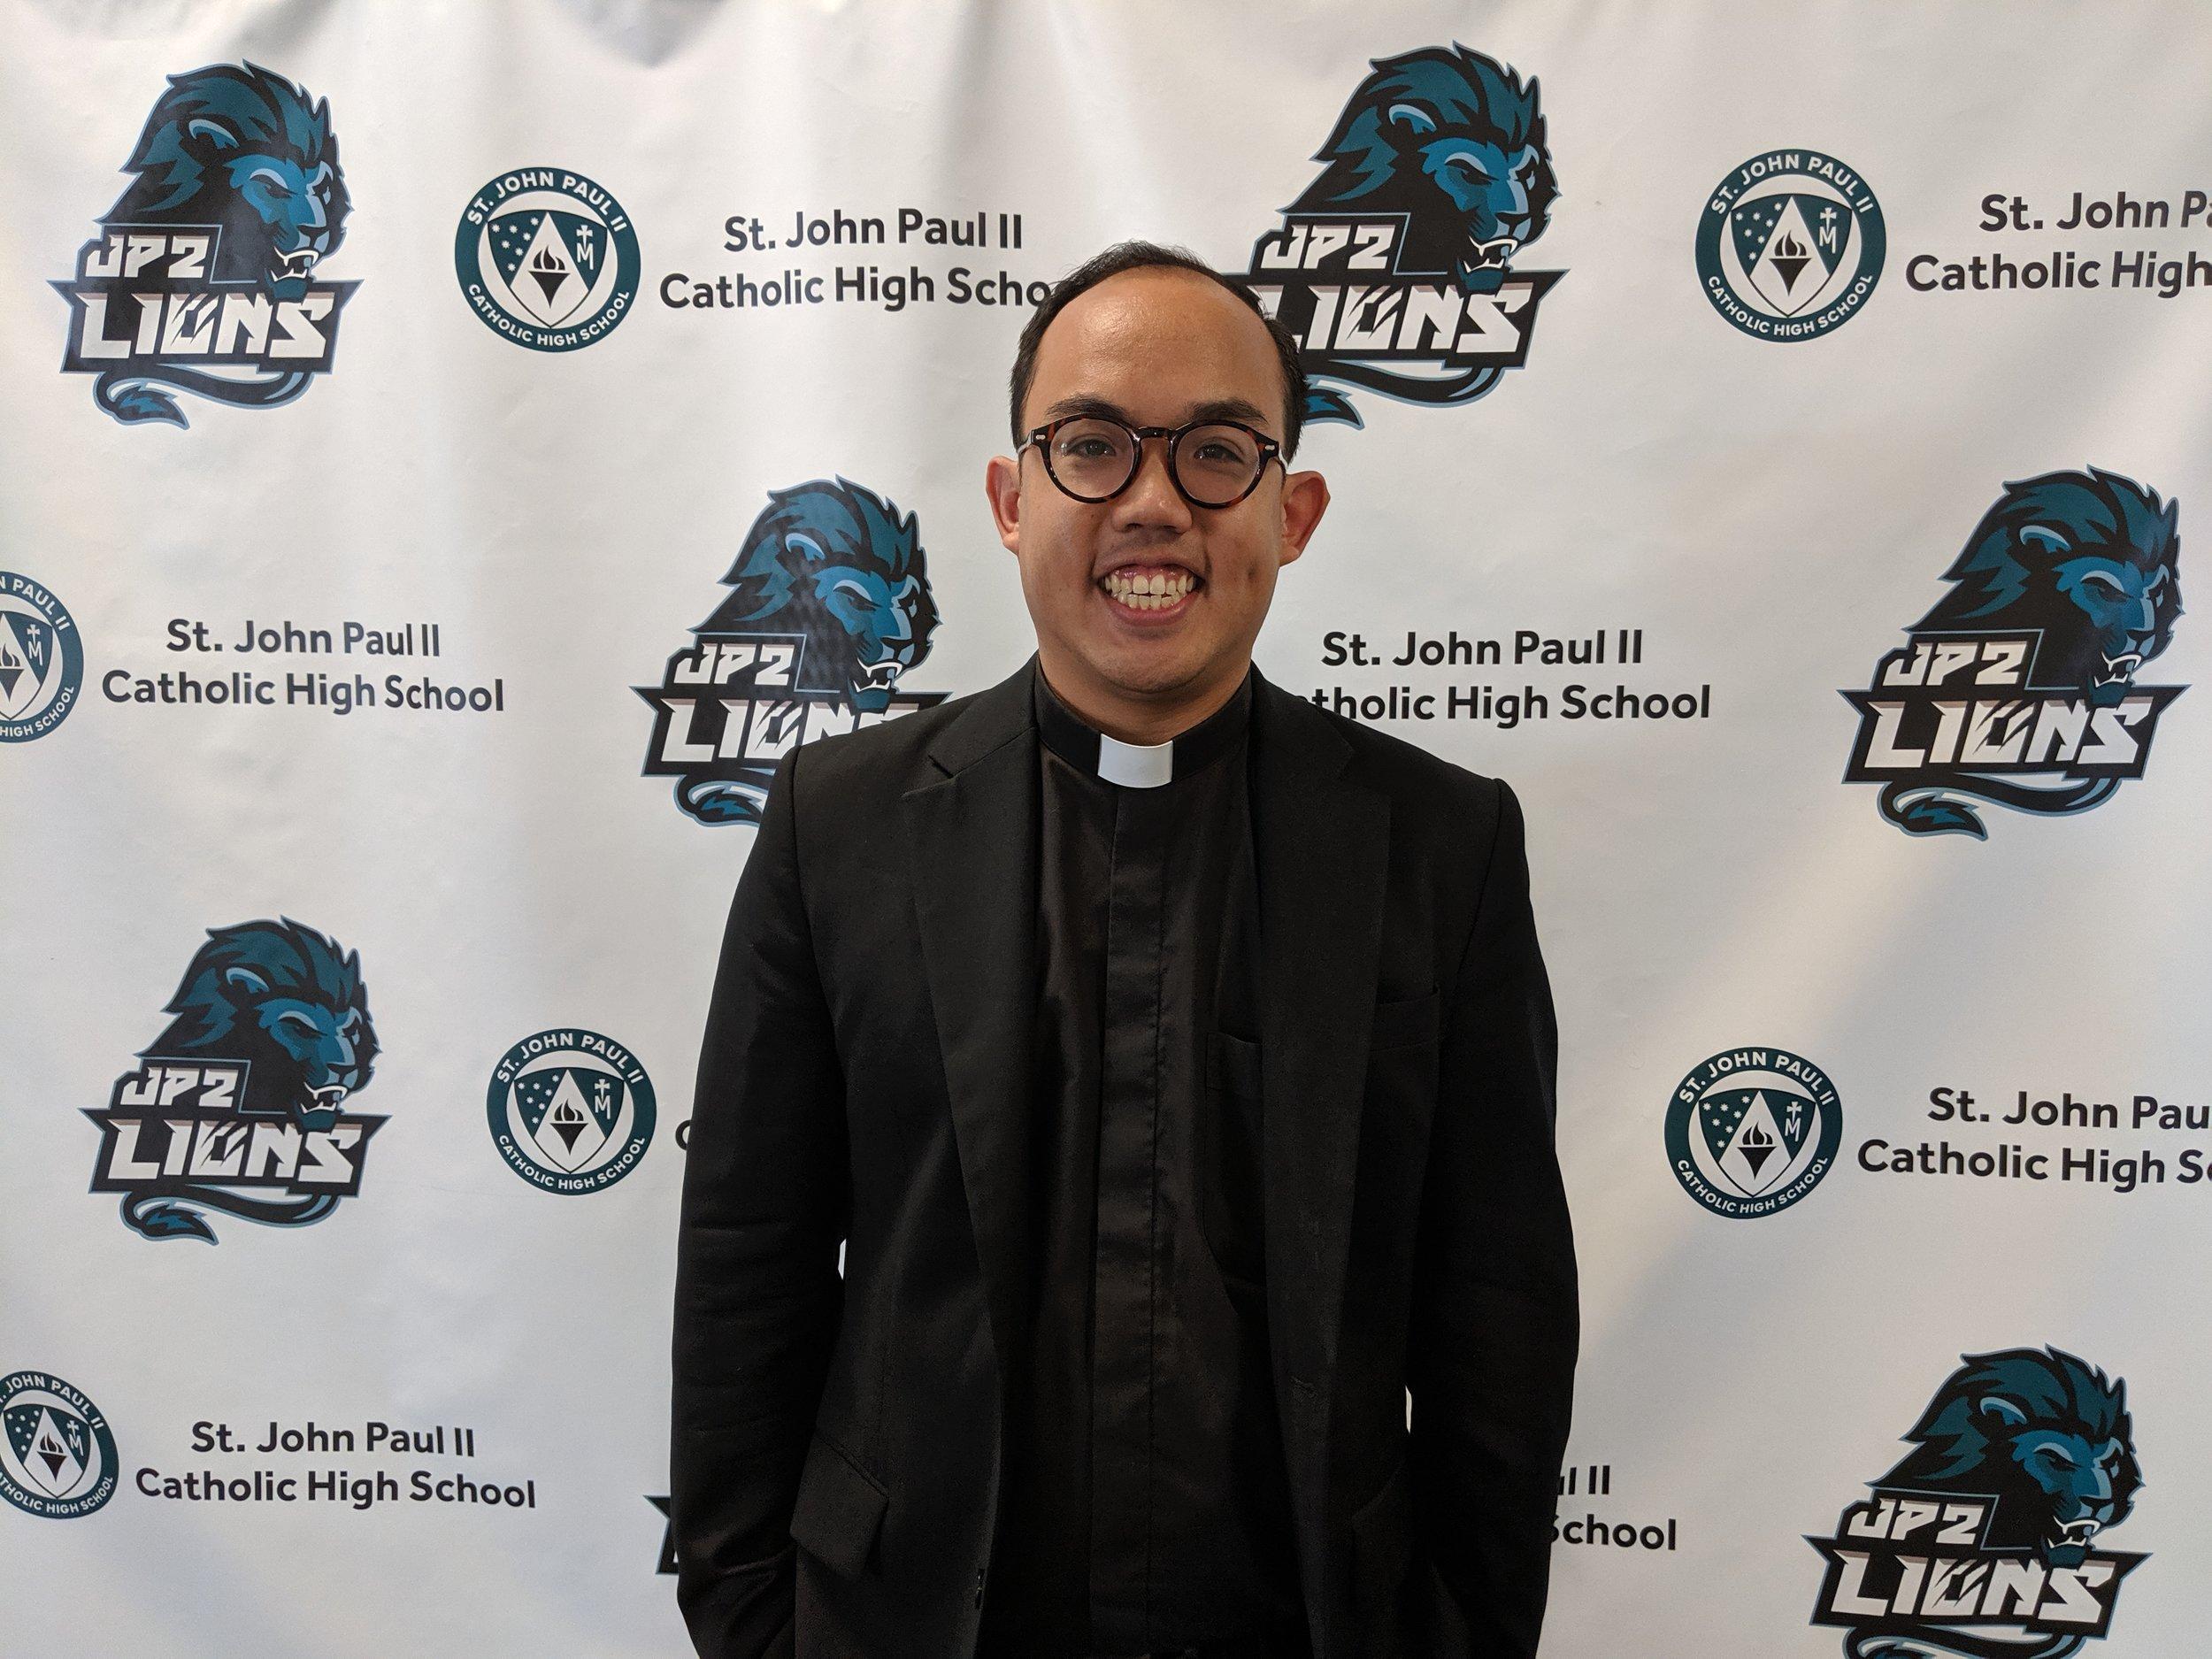 Fr. Vinhson Nguyen